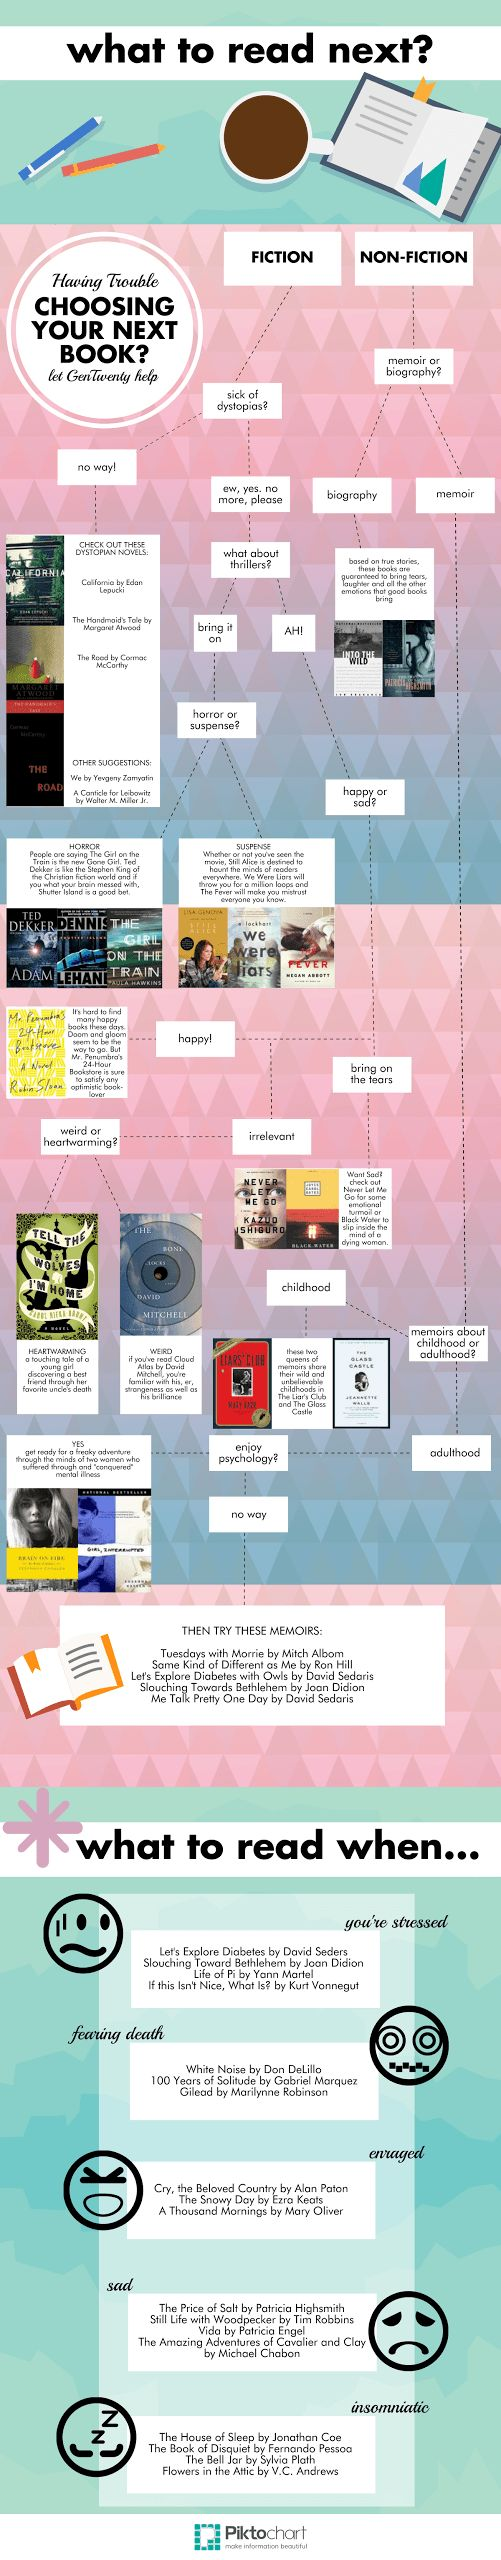 What Book Should You Read Next | GenTwenty